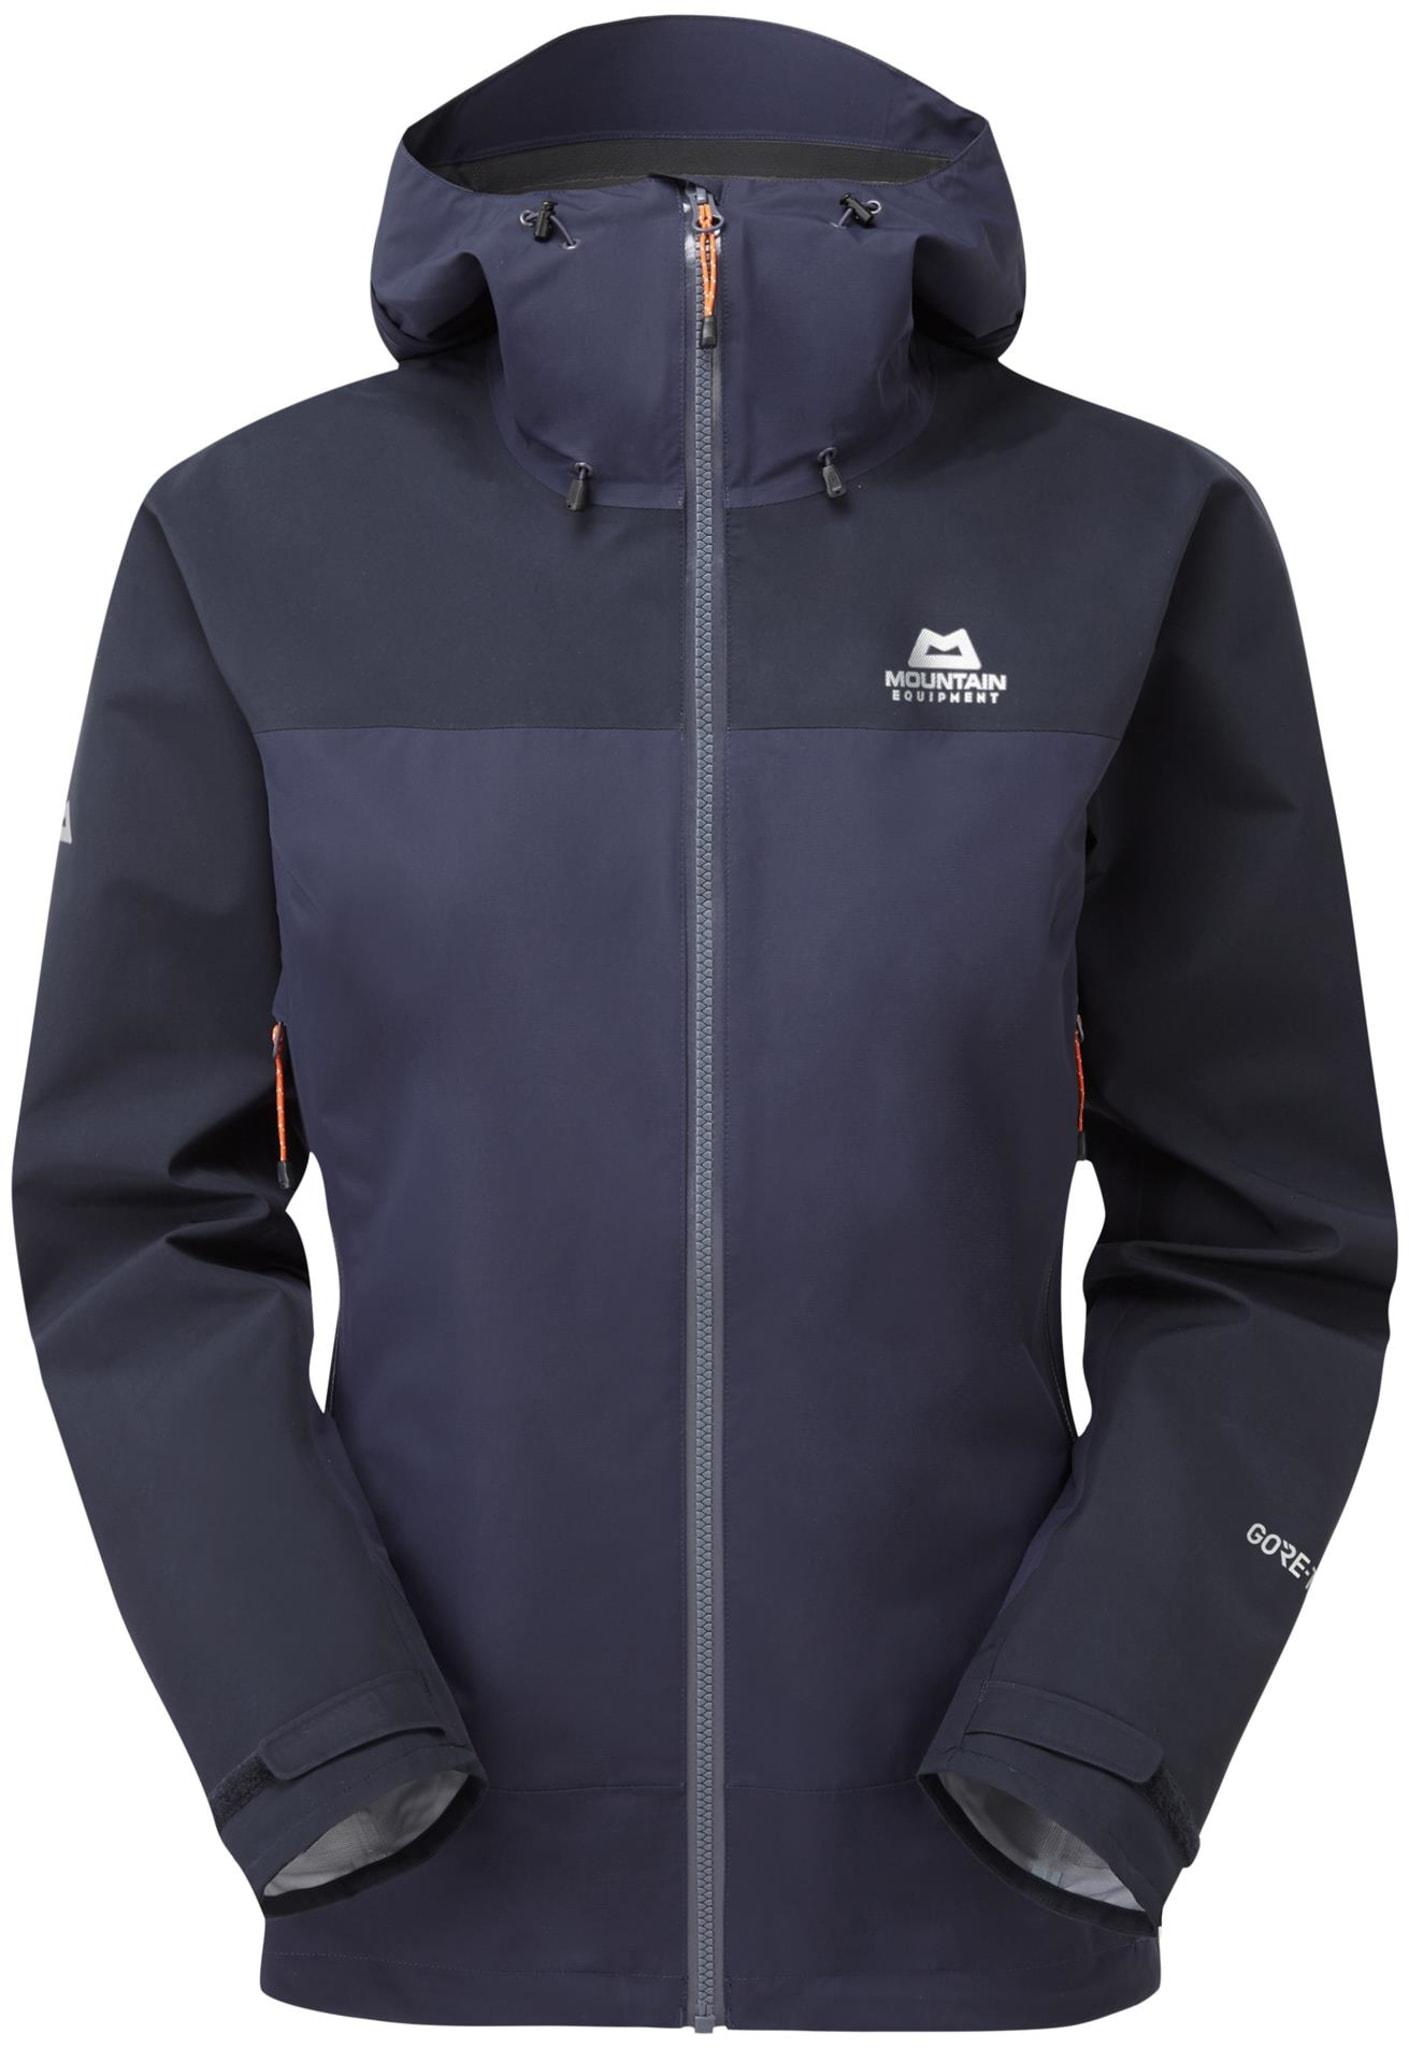 Saltoro Jacket Ws